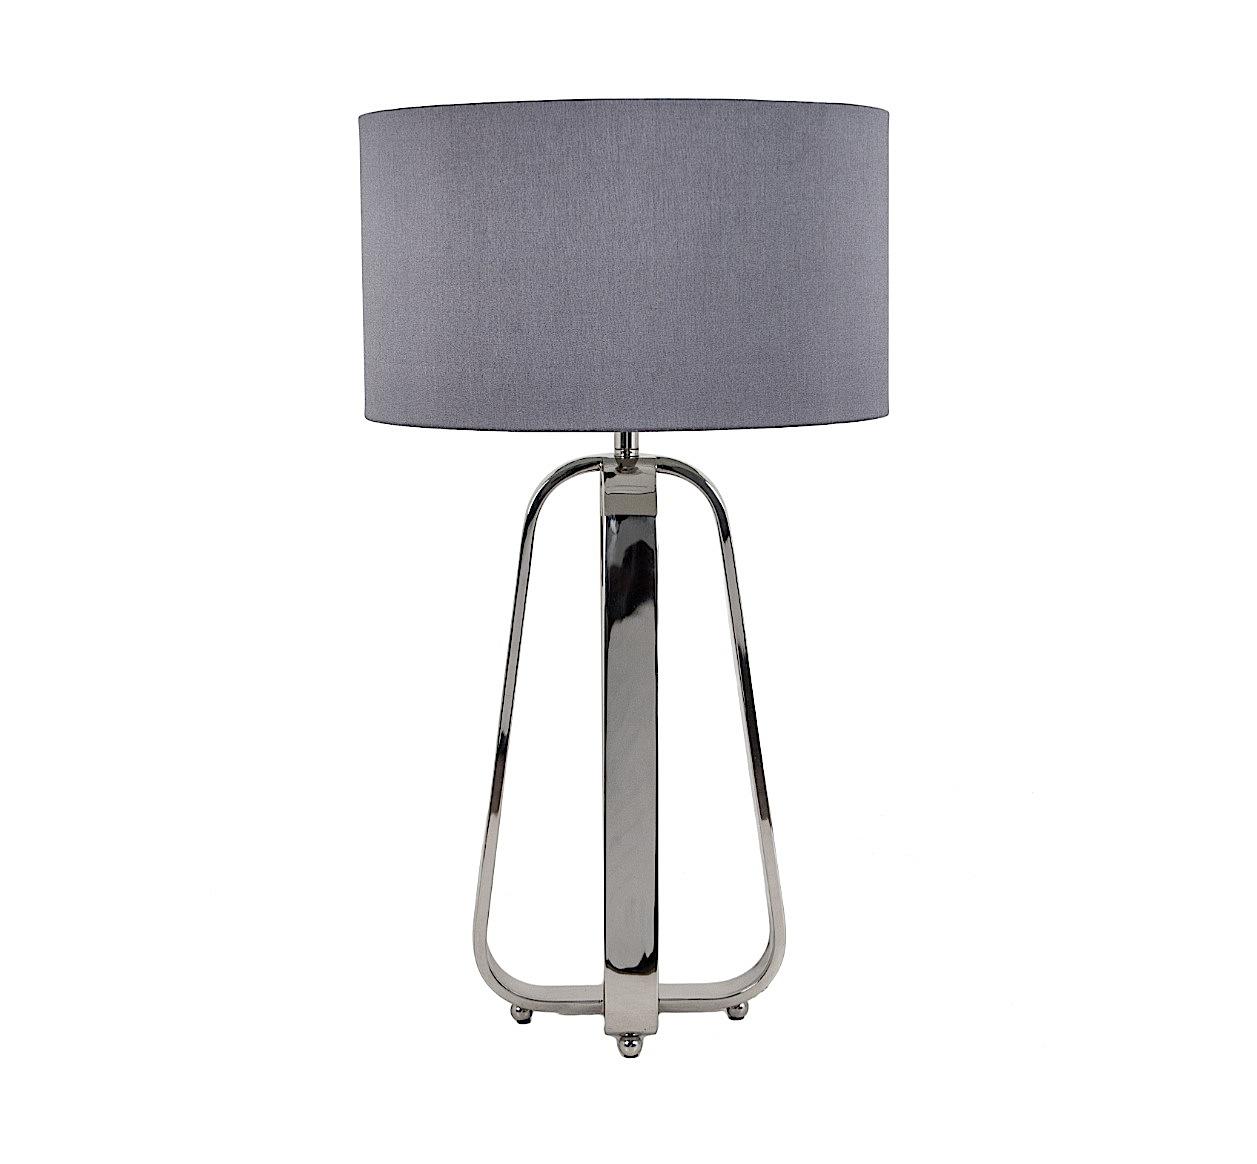 FONTANA TABLE LAMP WITH SHADE -0